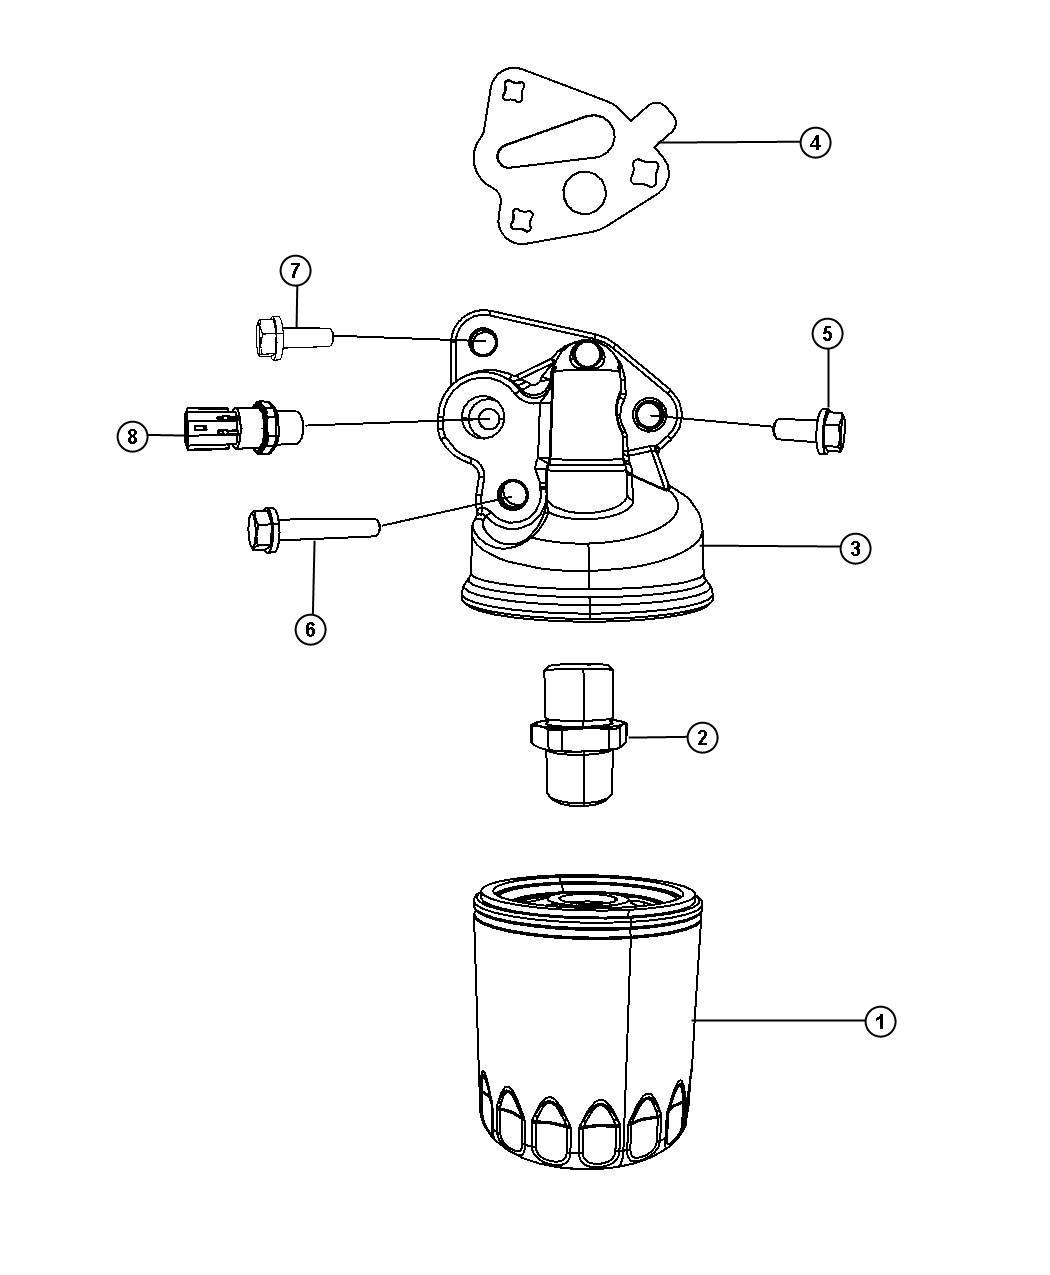 Dodge Intrepid Sending unit, switch. Oil pressure